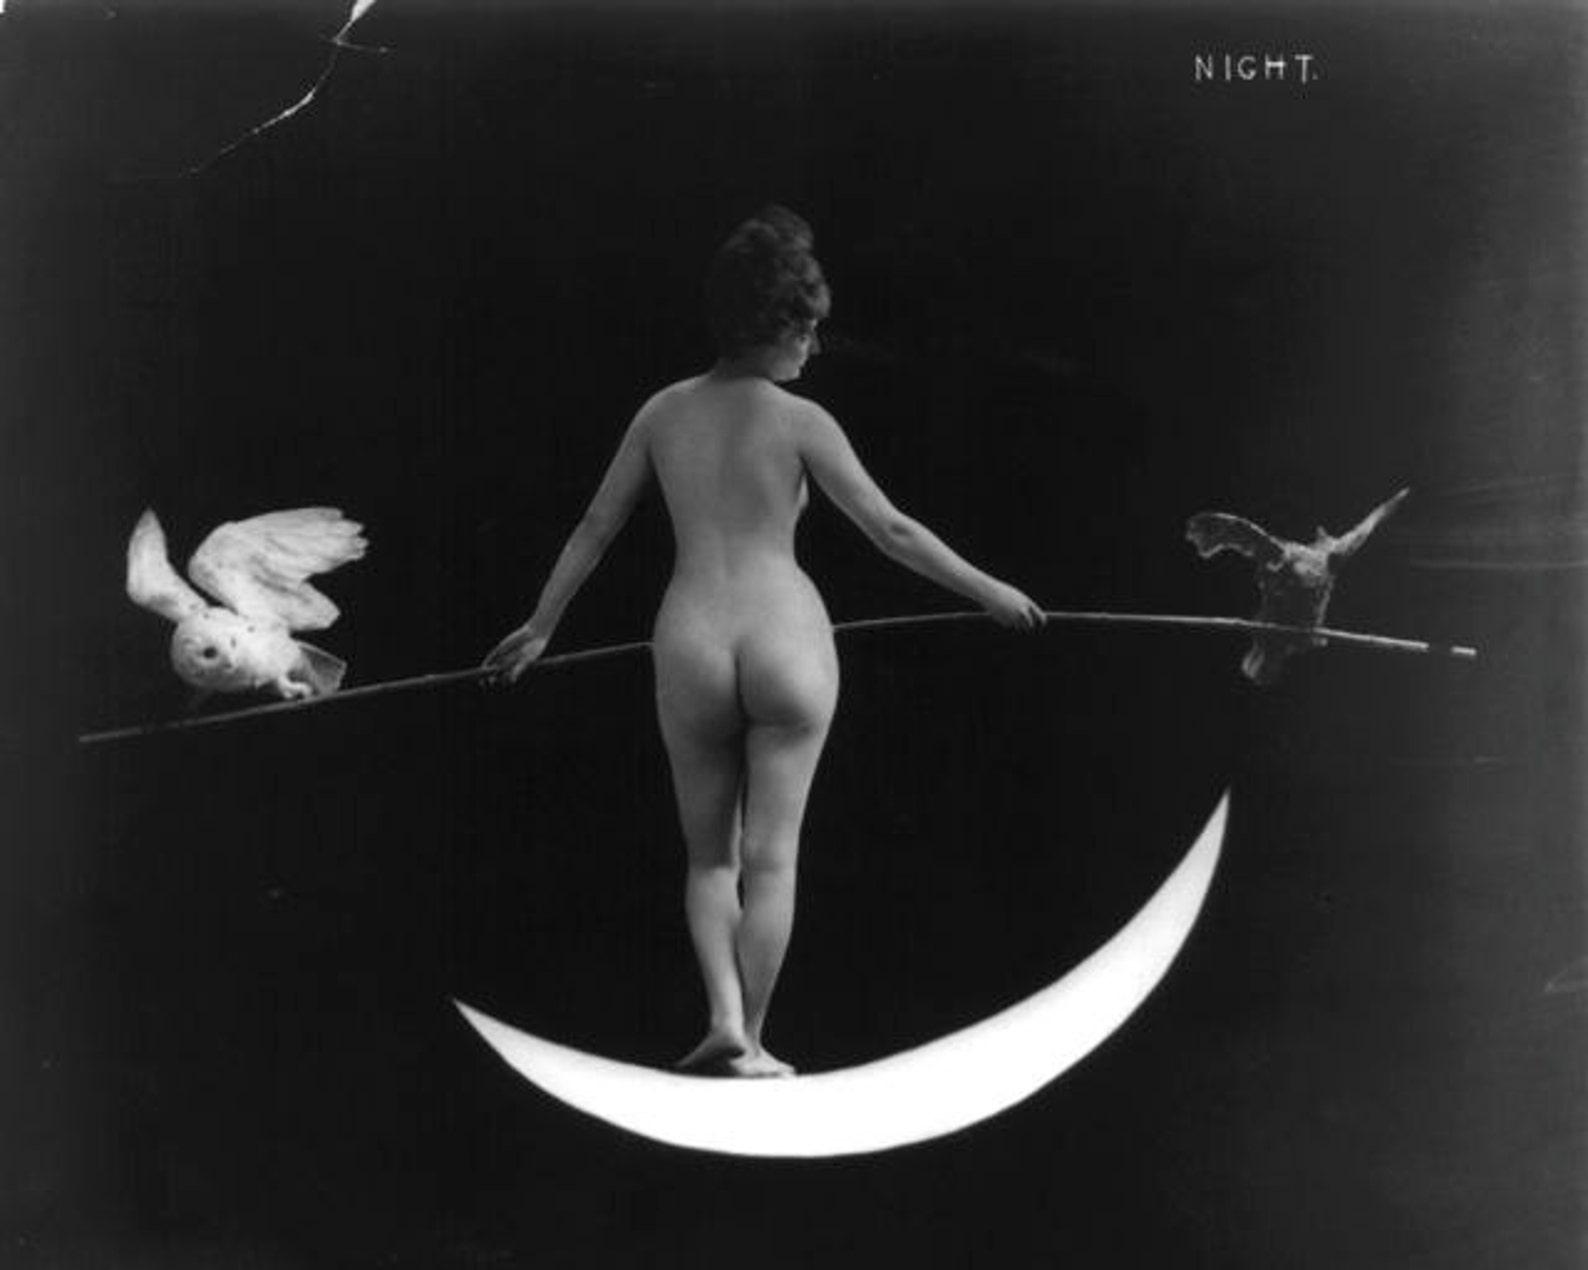 Hot moon naked woman beautiful fat ass